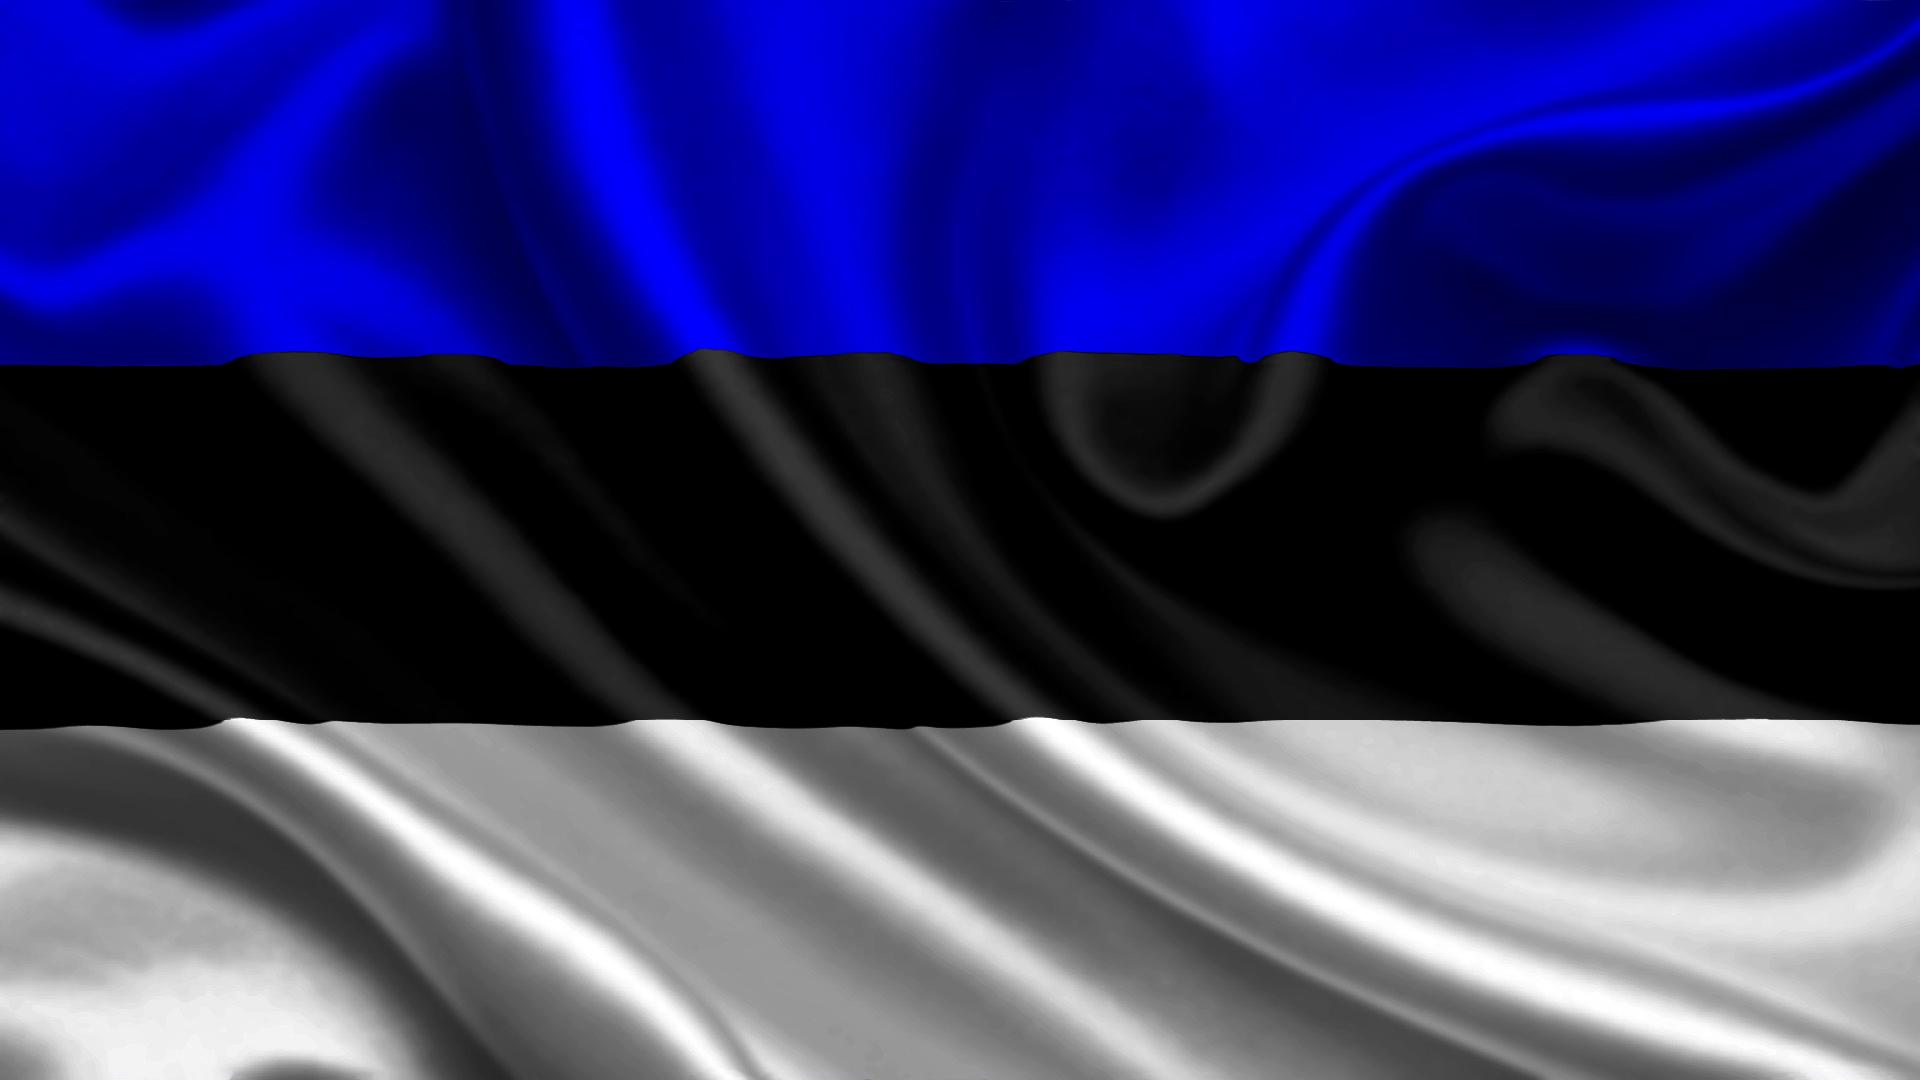 Estonia Flag Wallpaper 51631 1920x1080px 1920x1080